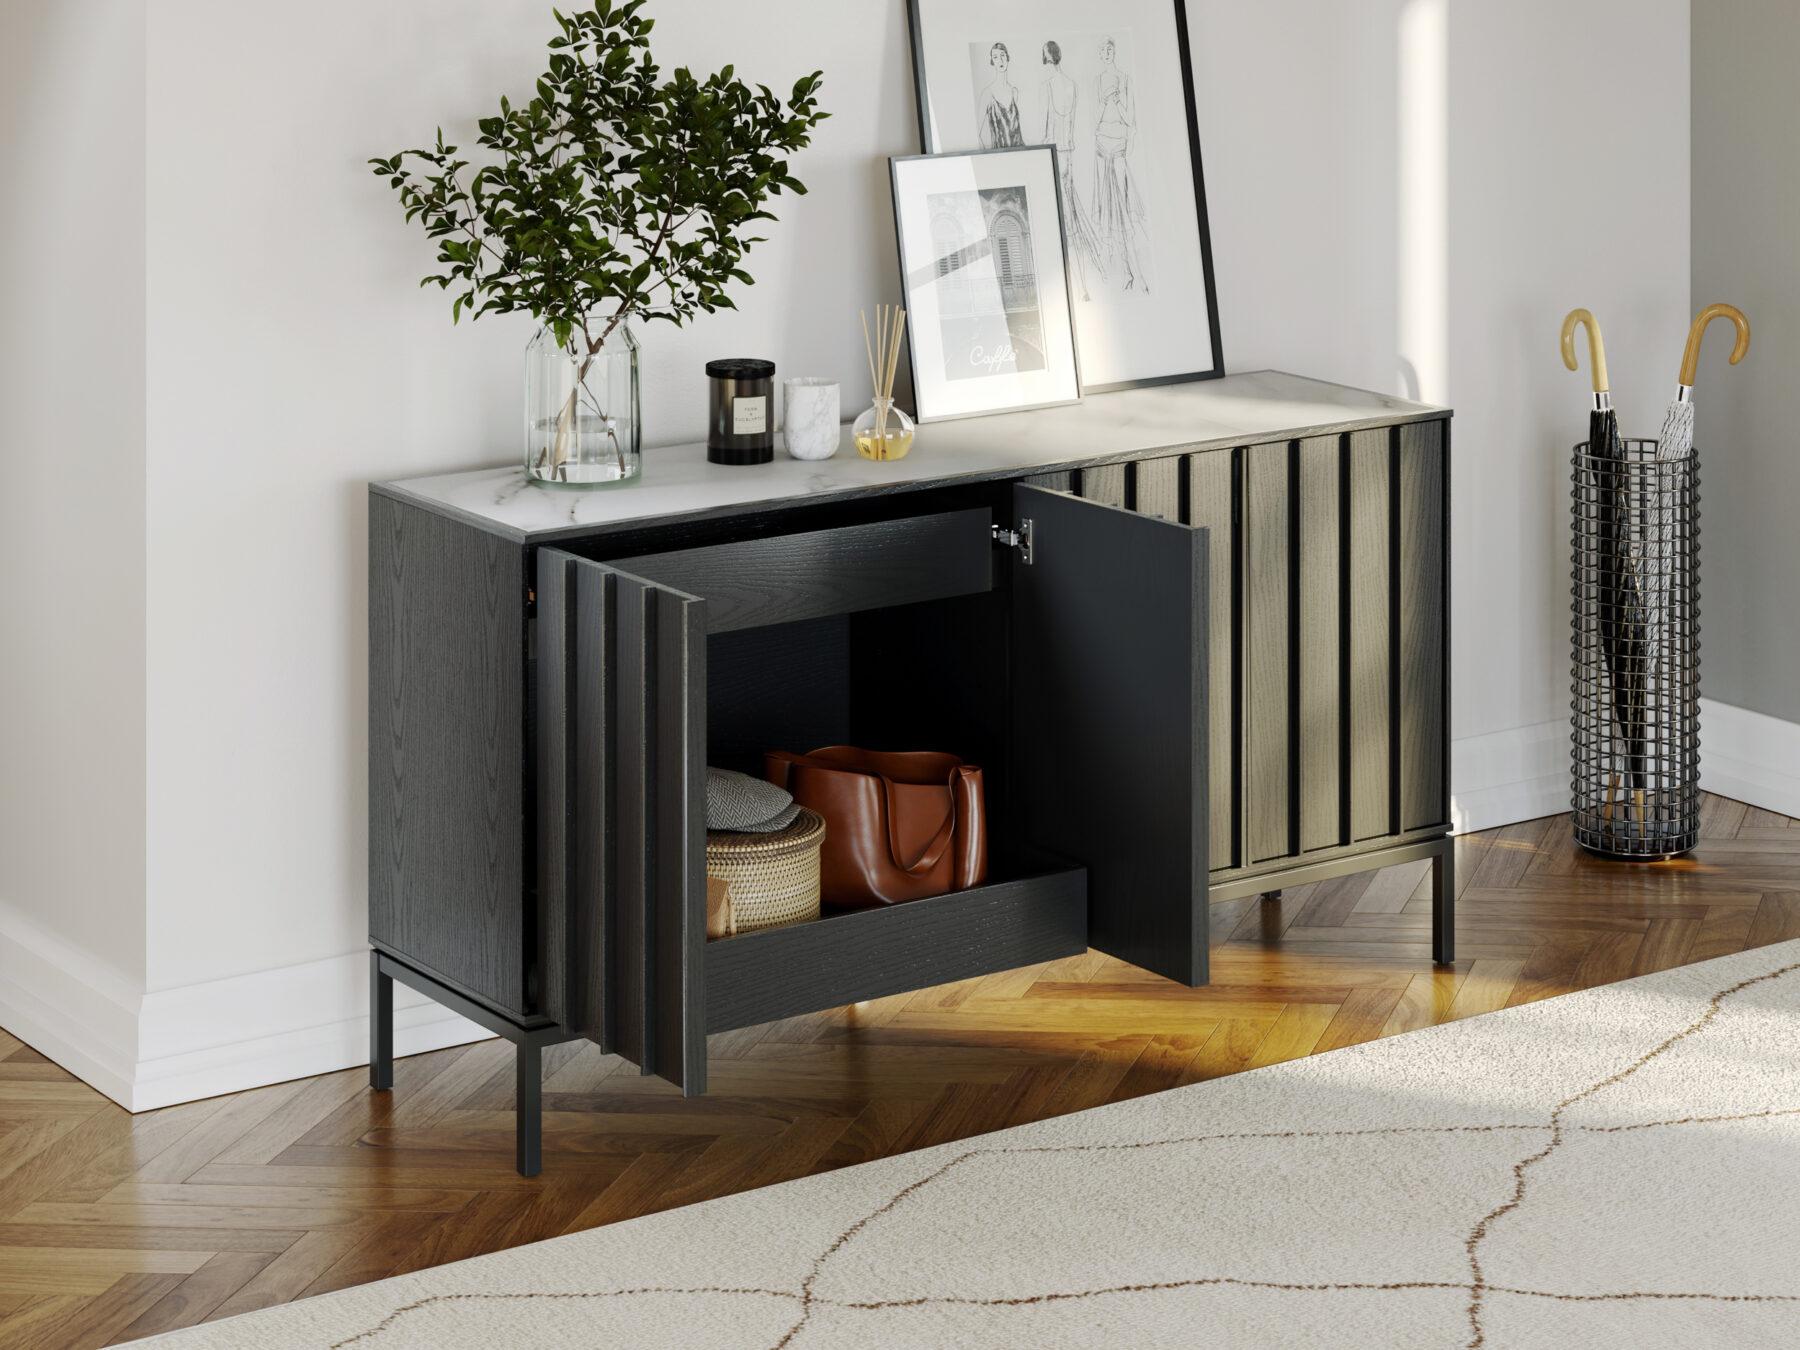 cosmo-5729-BDI-modern-storage-cabinet-EBO-LS1b